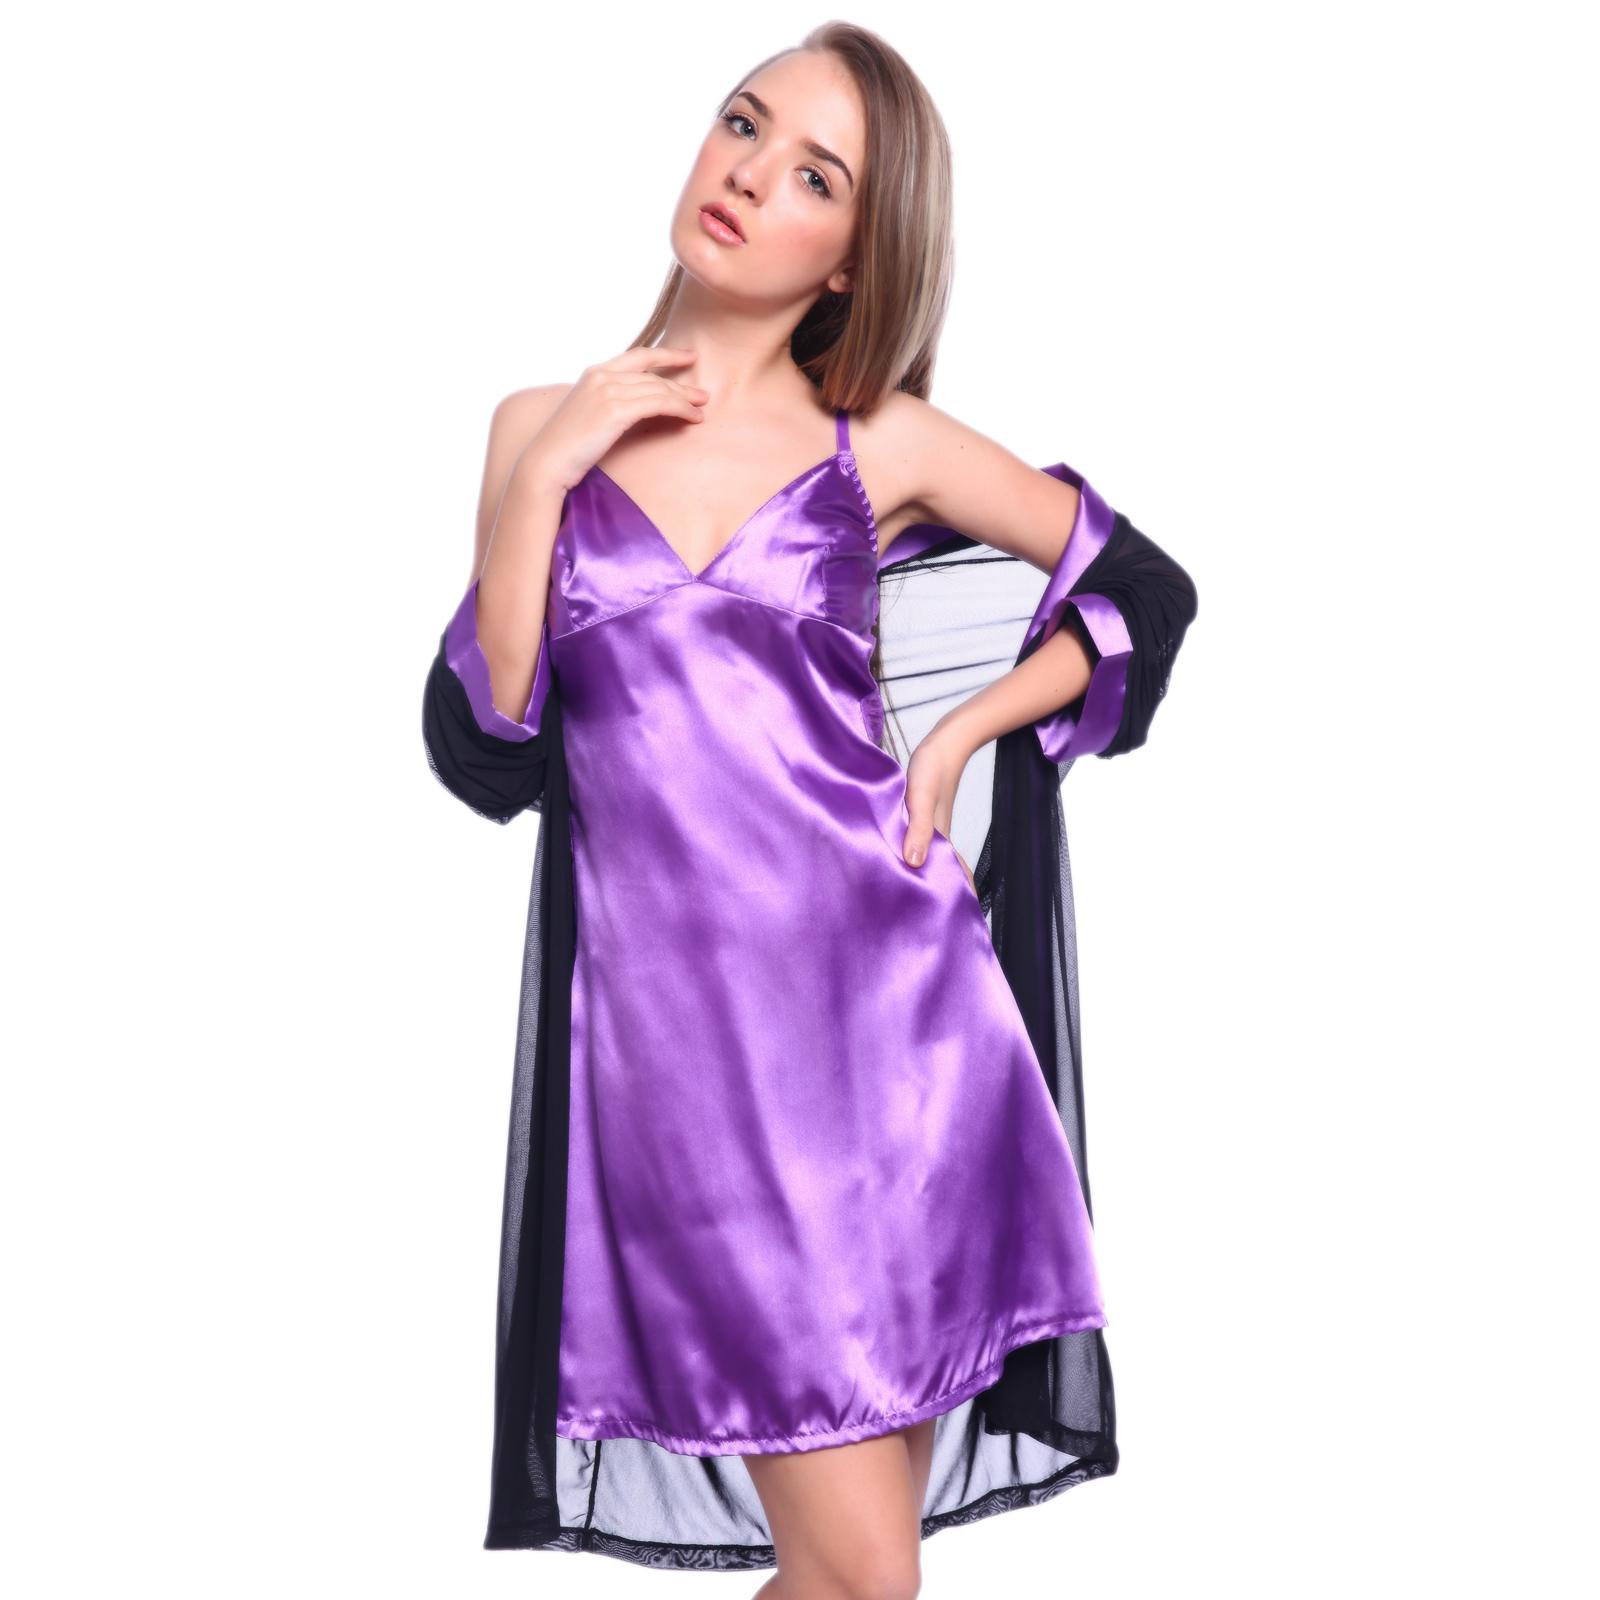 Women Purple Satin Silk Lace Sleepwear Dress Robe Pyjamas Night Gown  Nightdress  a1bde2014